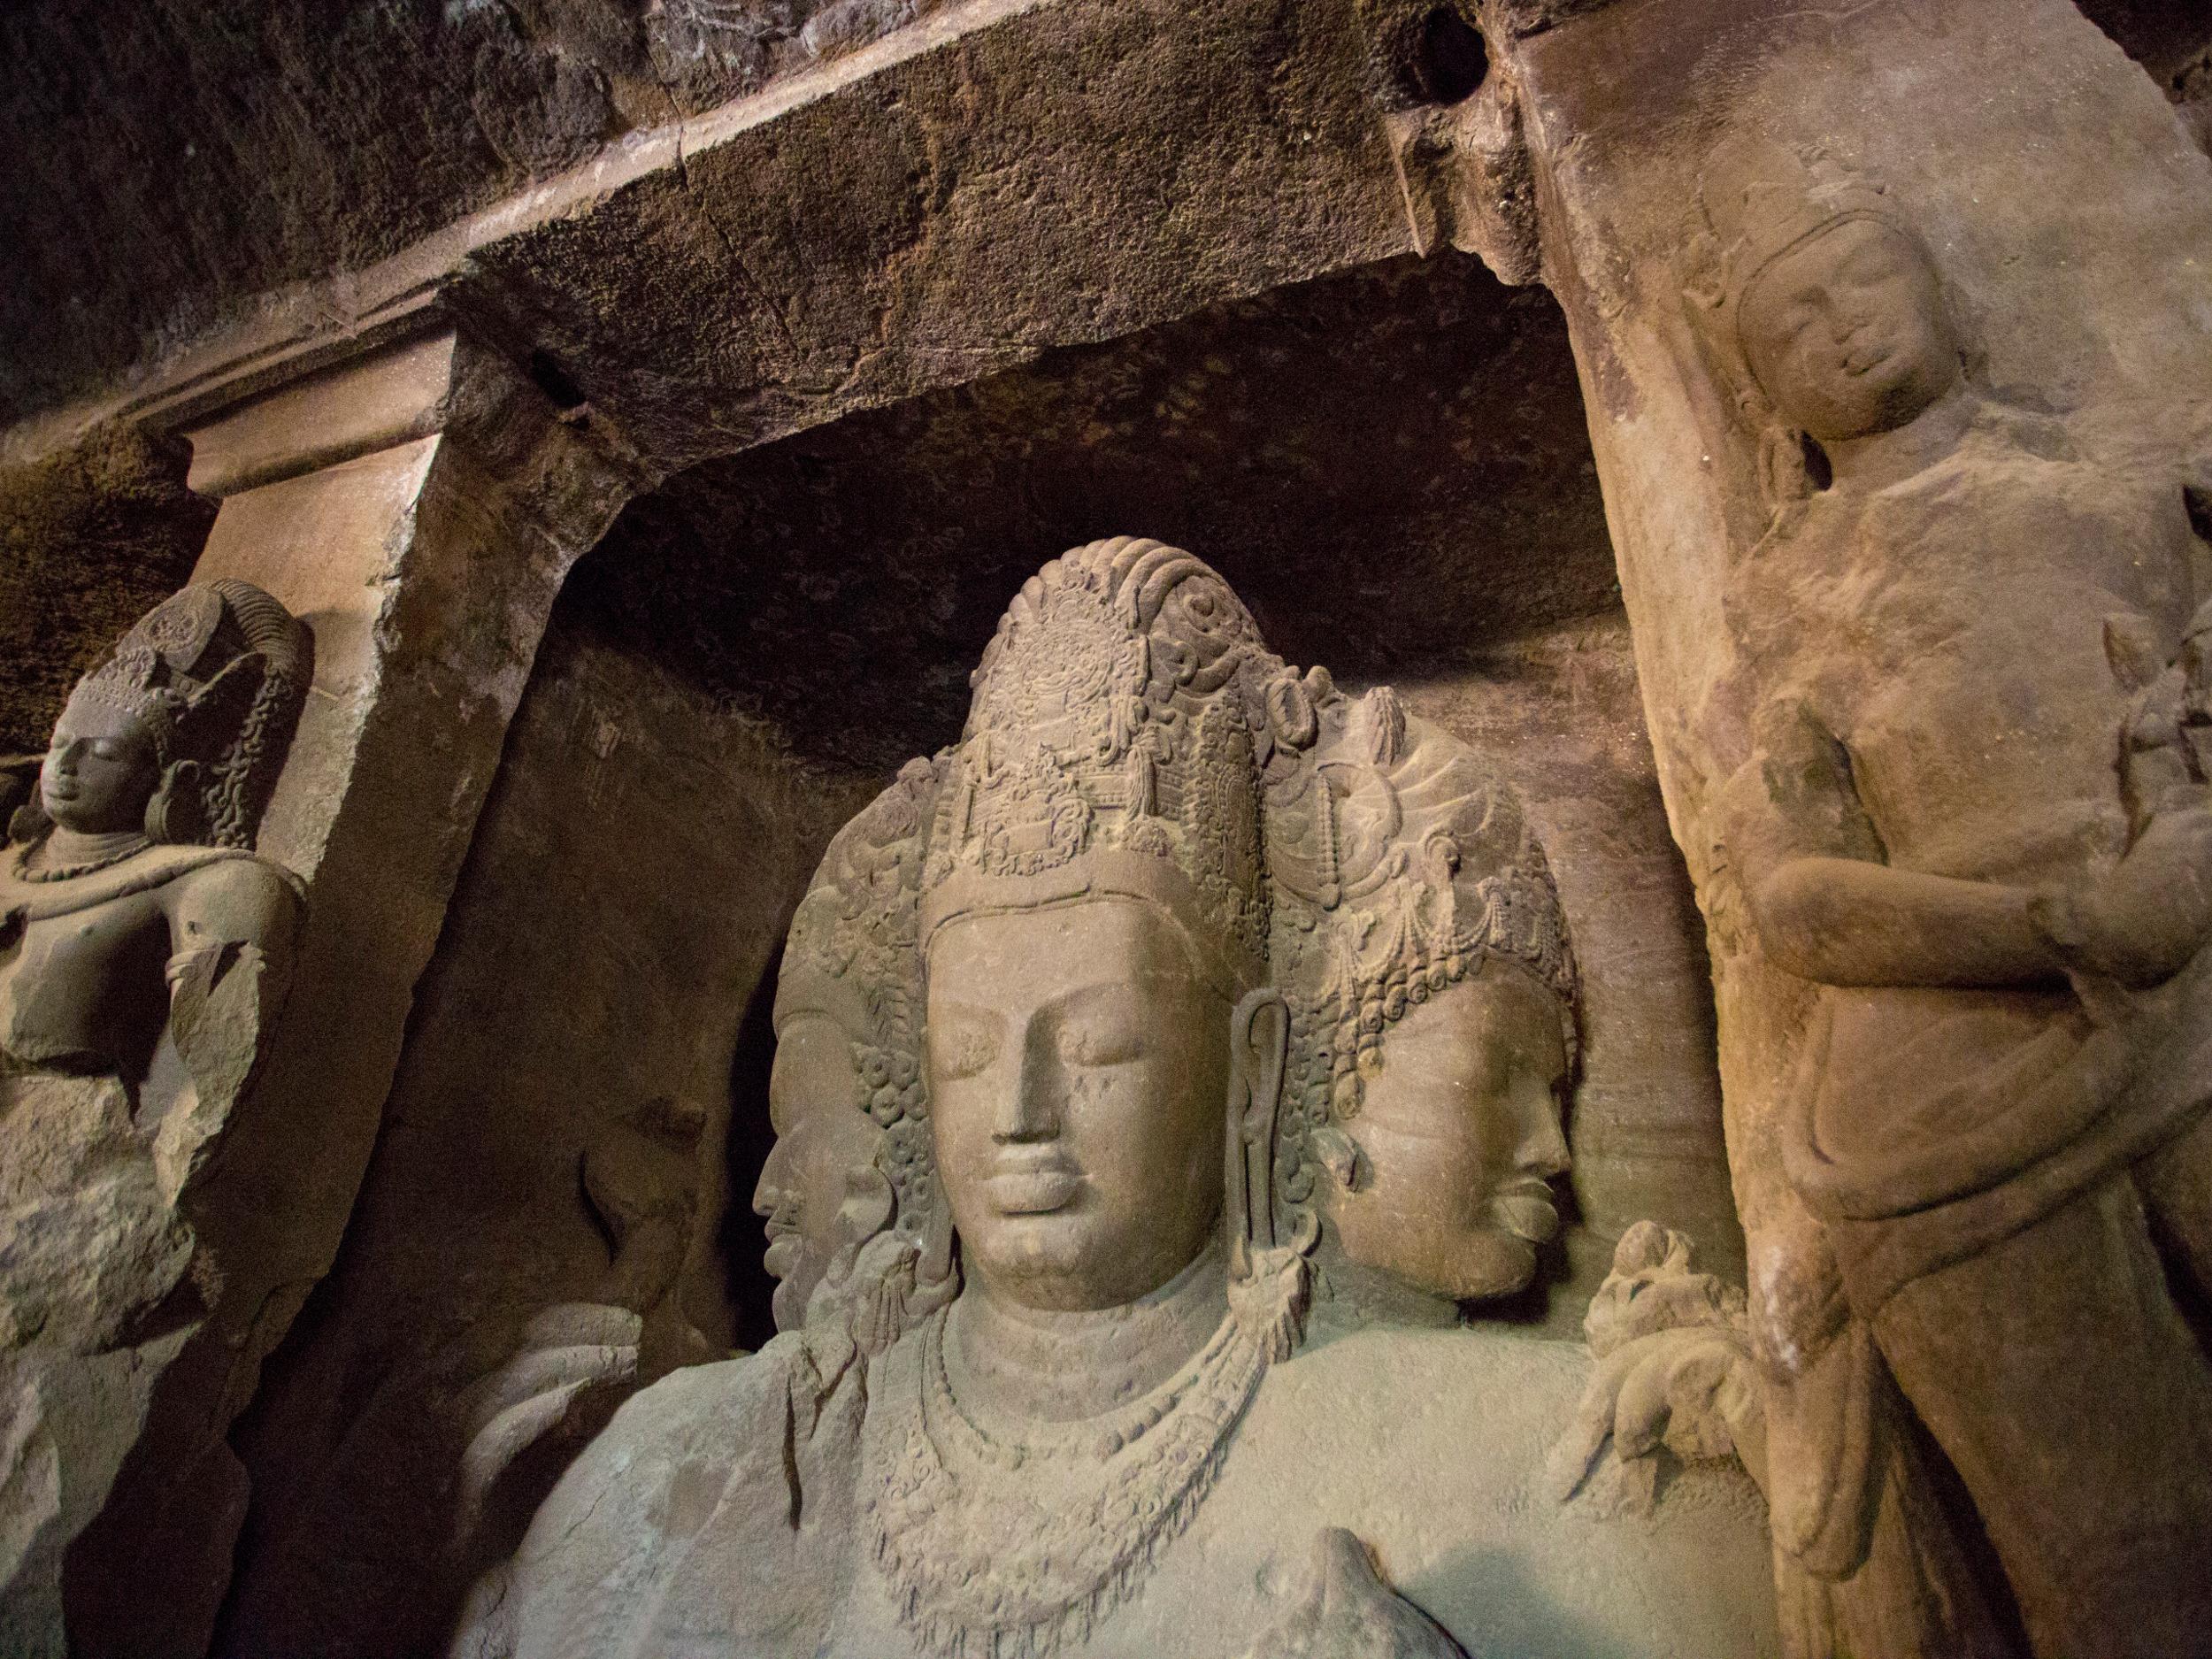 A Choice Car Insurance >> Elephanta Island | Mumbai, India Attractions - Lonely Planet